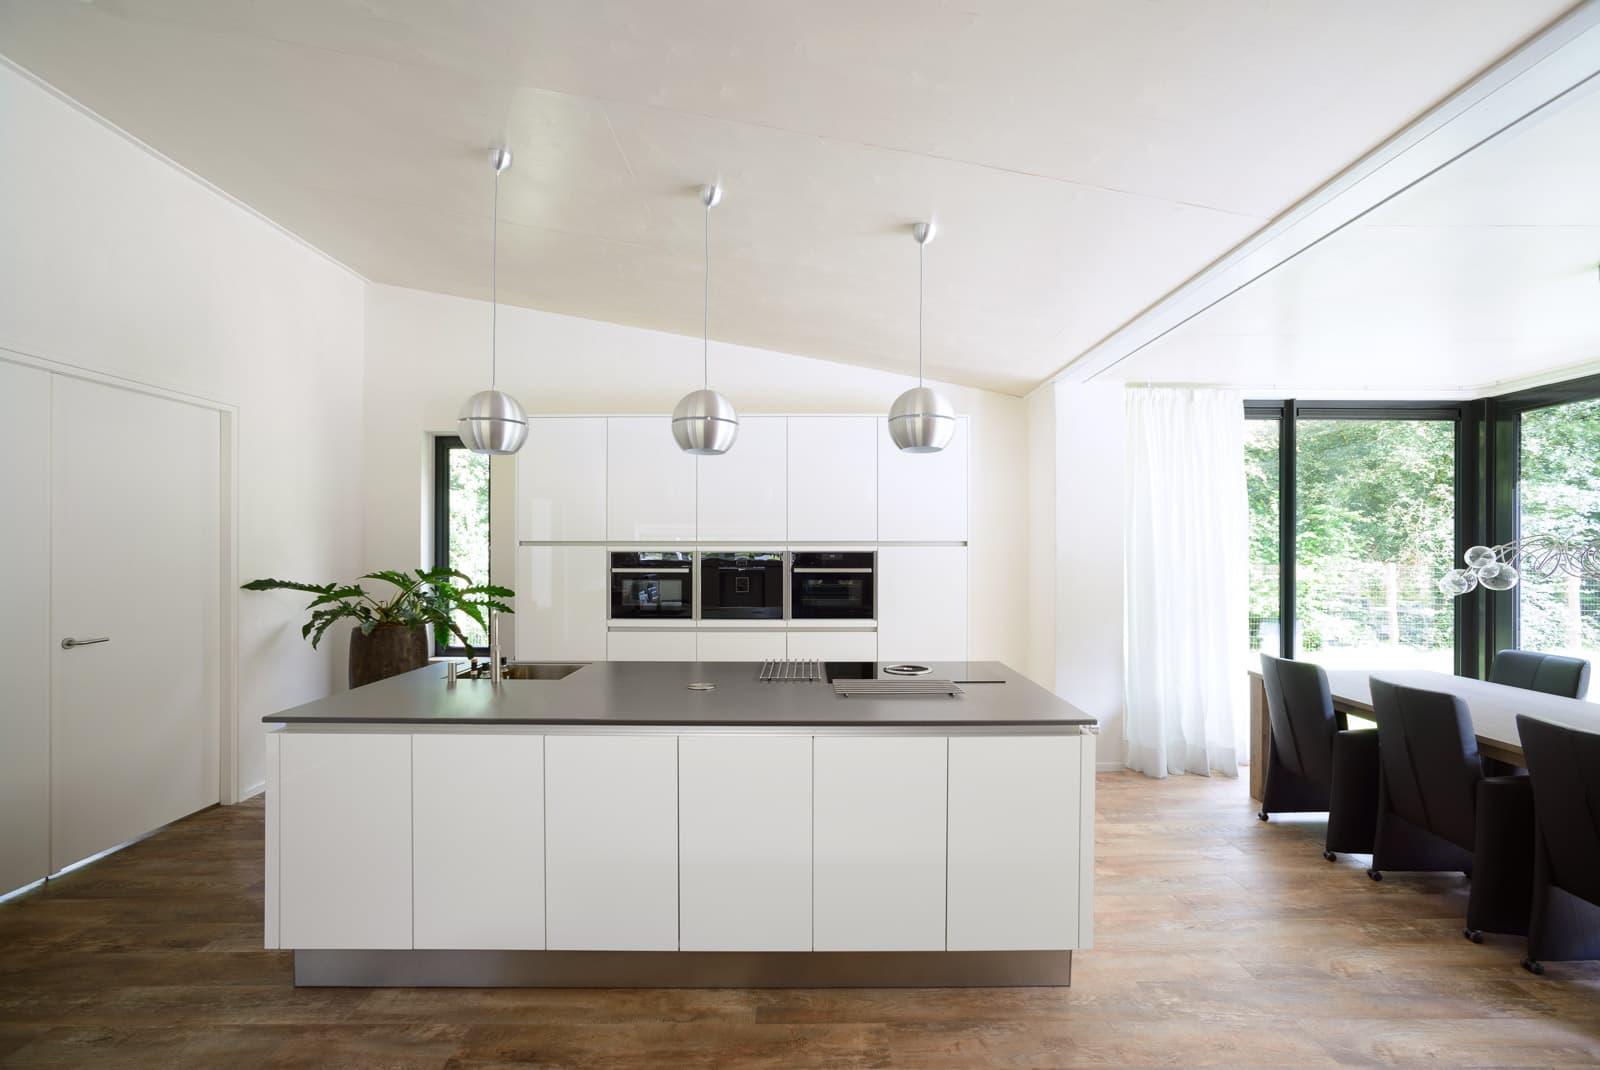 Verbazingwekkend Hoogglans wit gelakte keuken - Keukenstudio Regio Oost XT-62